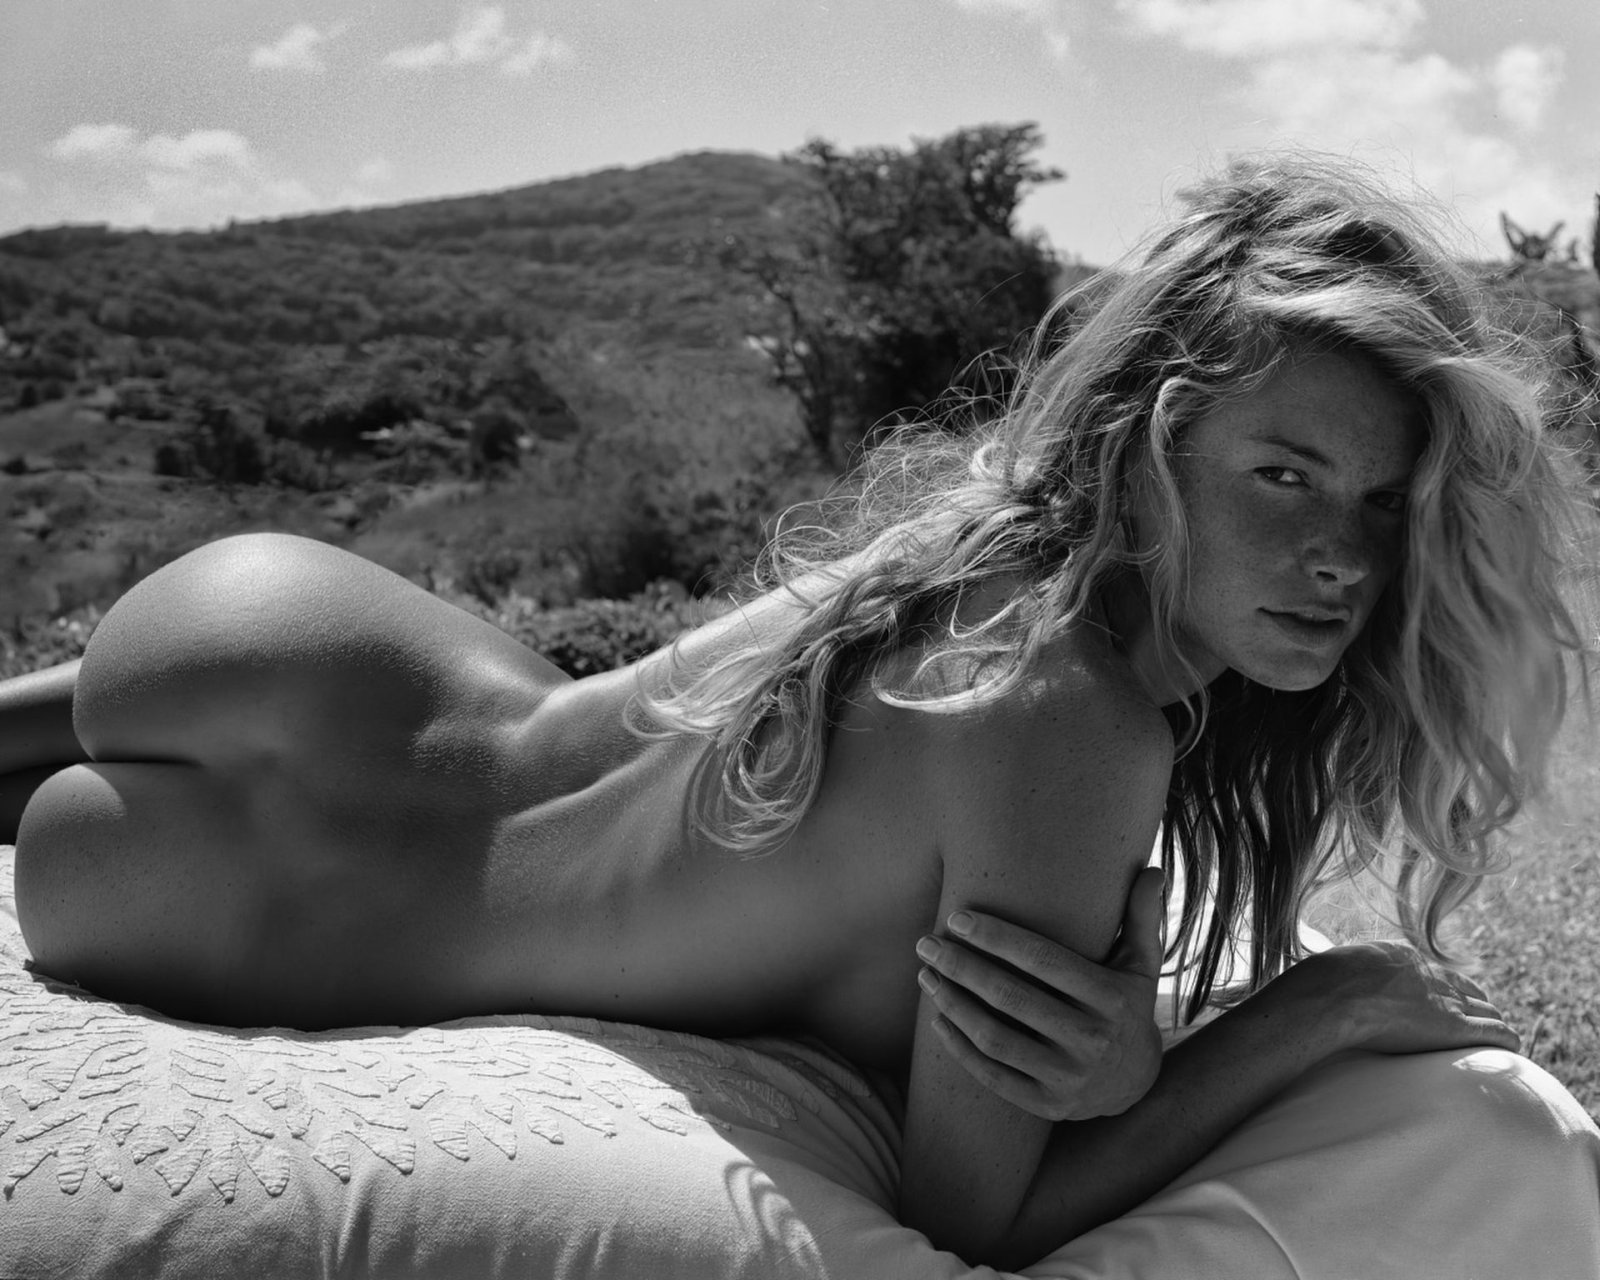 Marisa-Miller-Nude-TheFappeningBlog.com-19.jpg